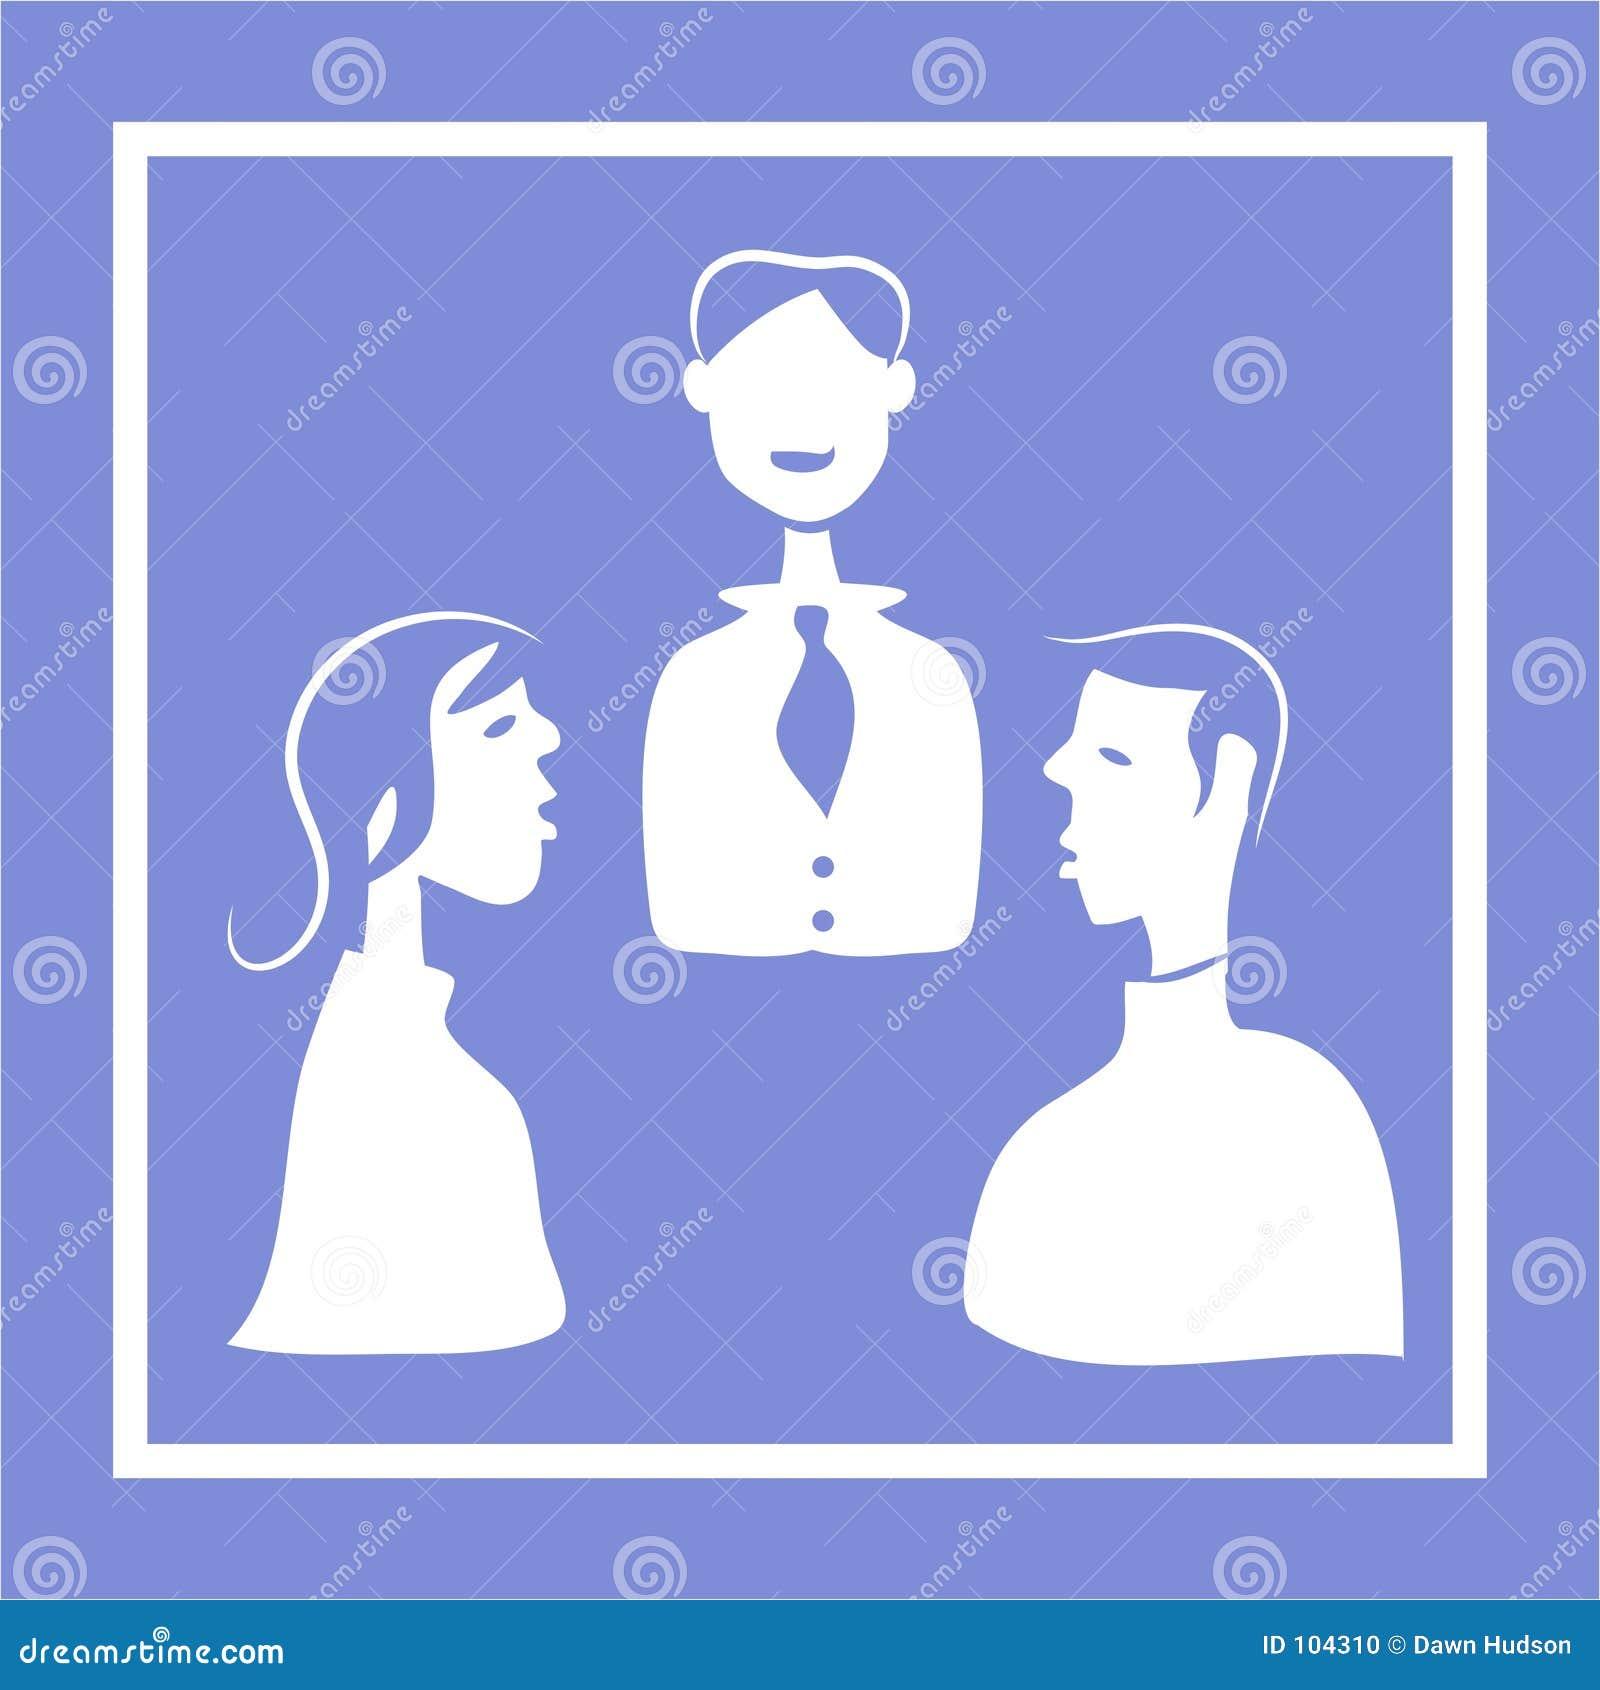 Sitzungs-Ikone